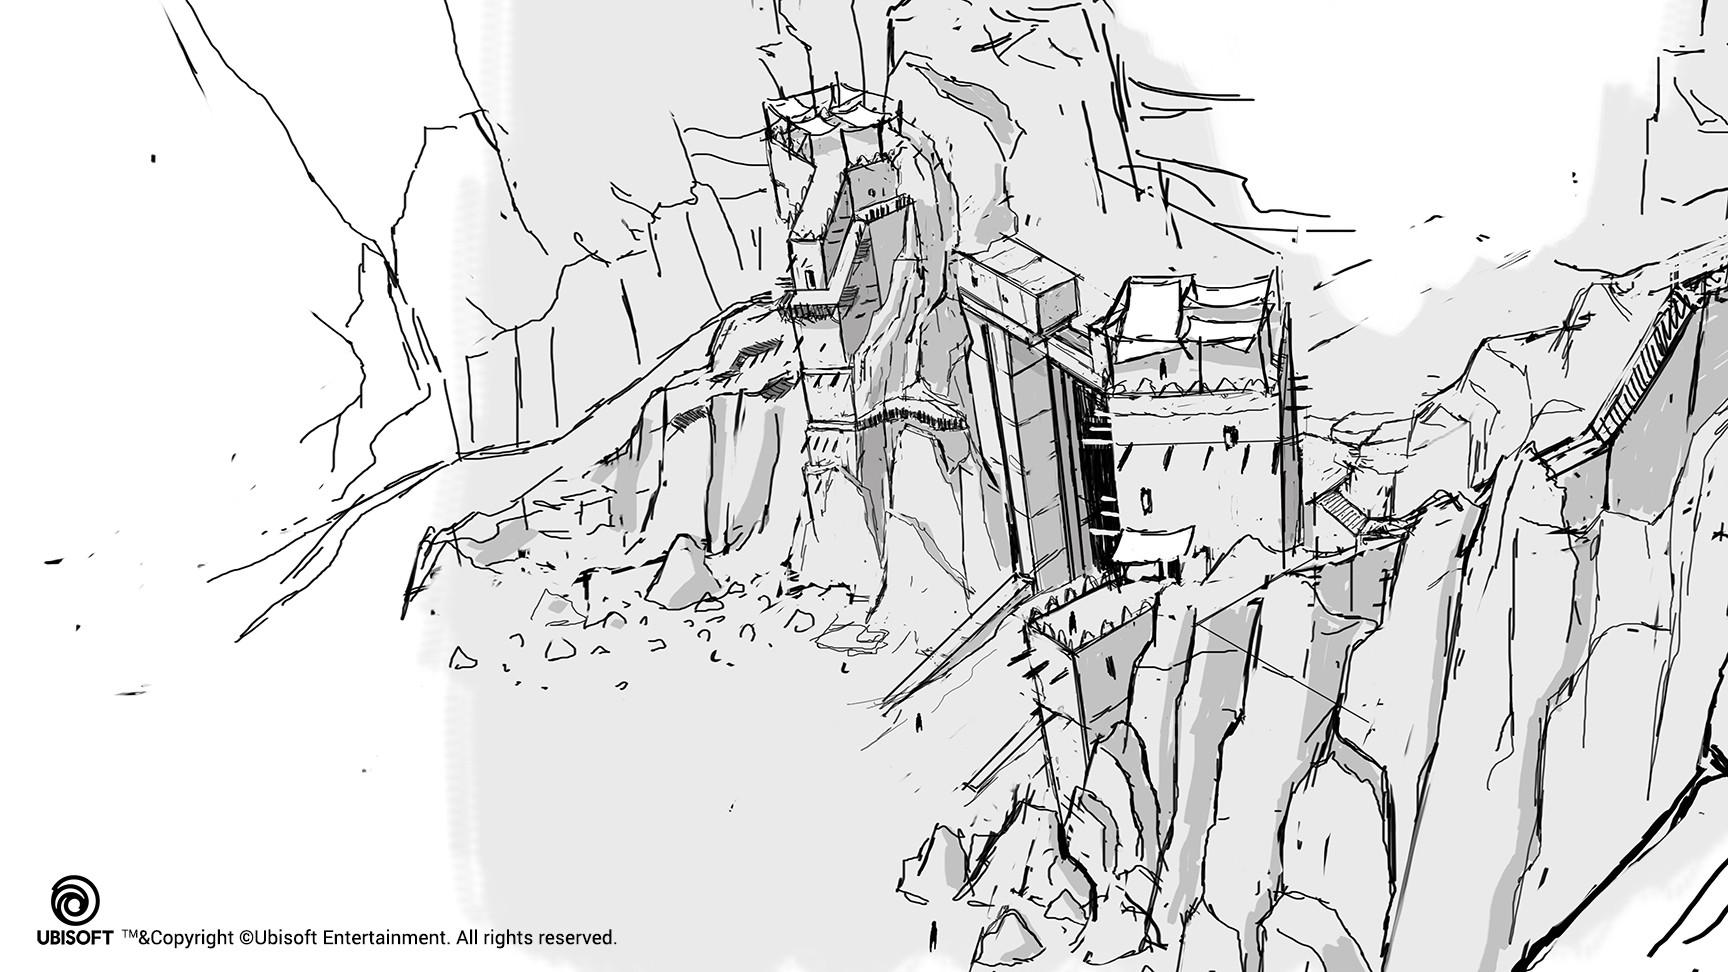 Eddie bennun ace env fortification gate 2 lr logo eddiebenun